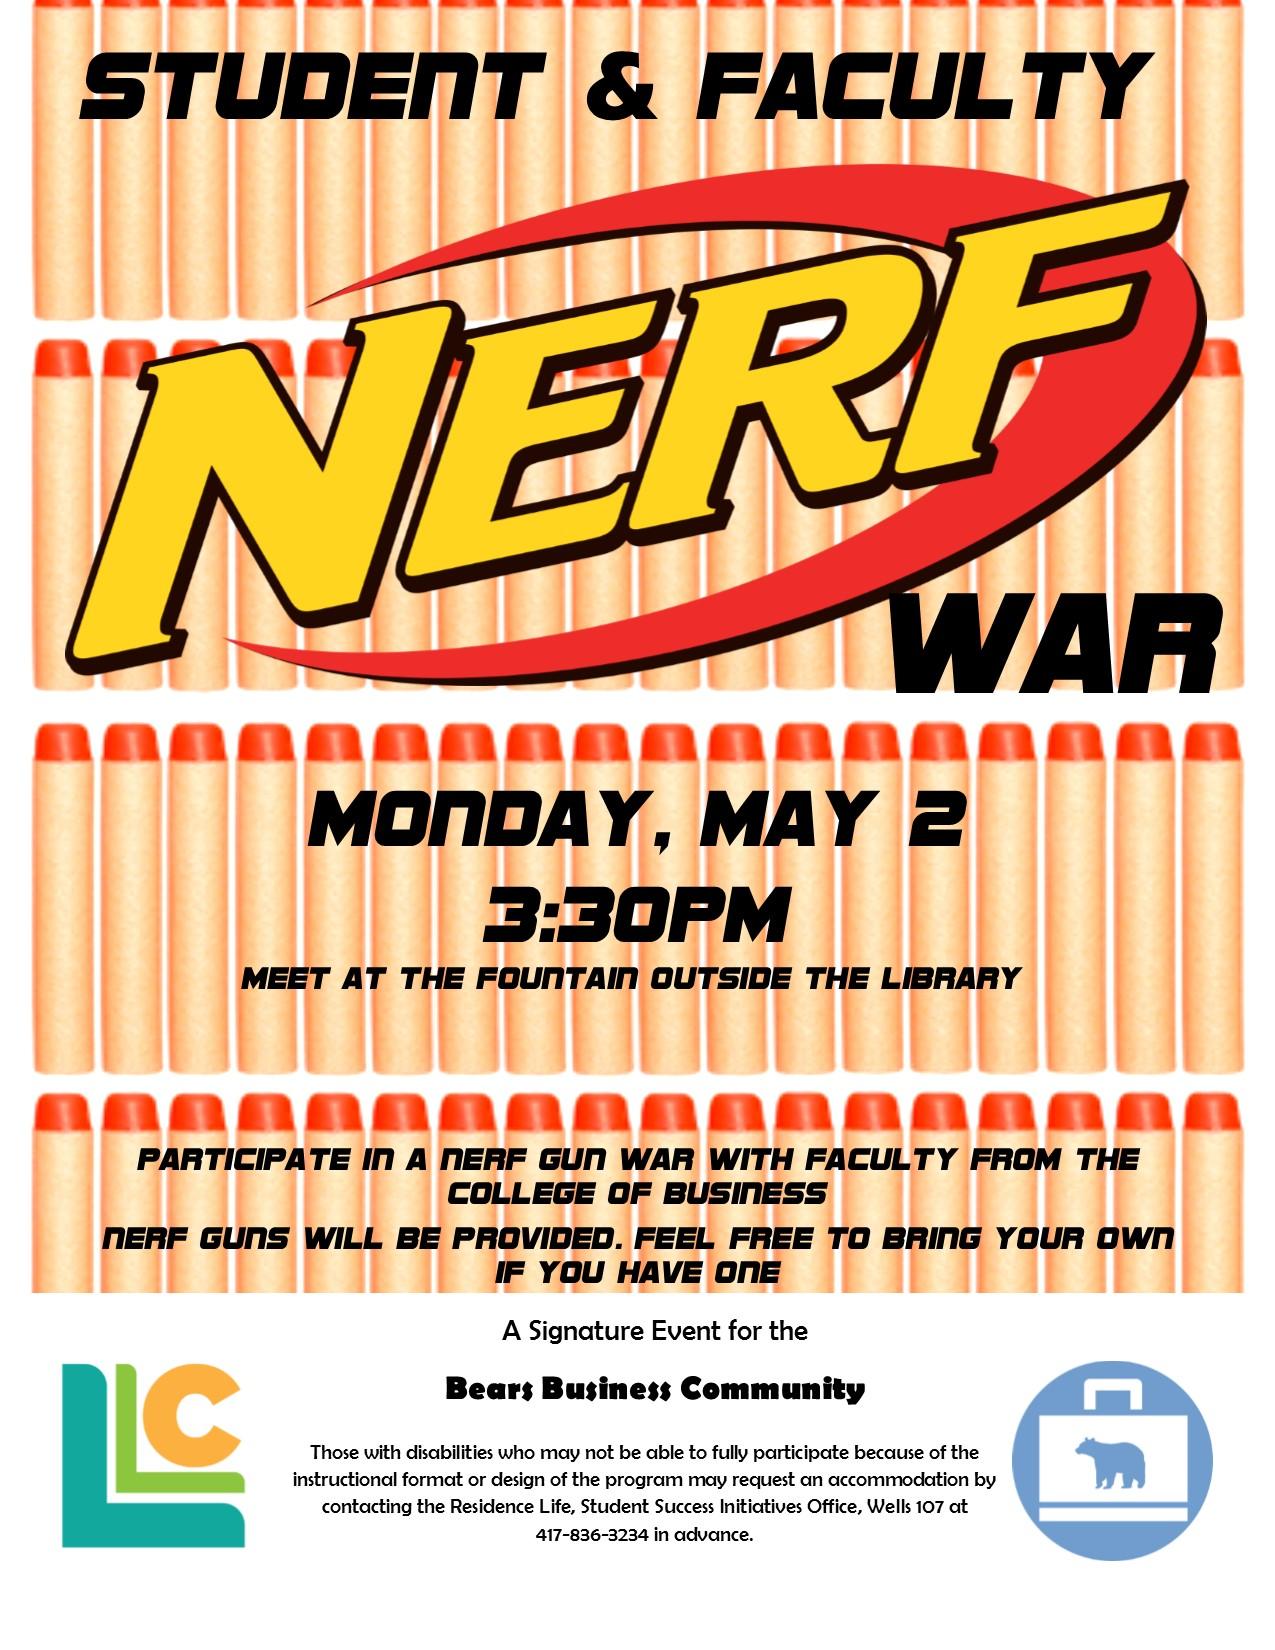 Bears Business LLC Student & Faculty NERF War